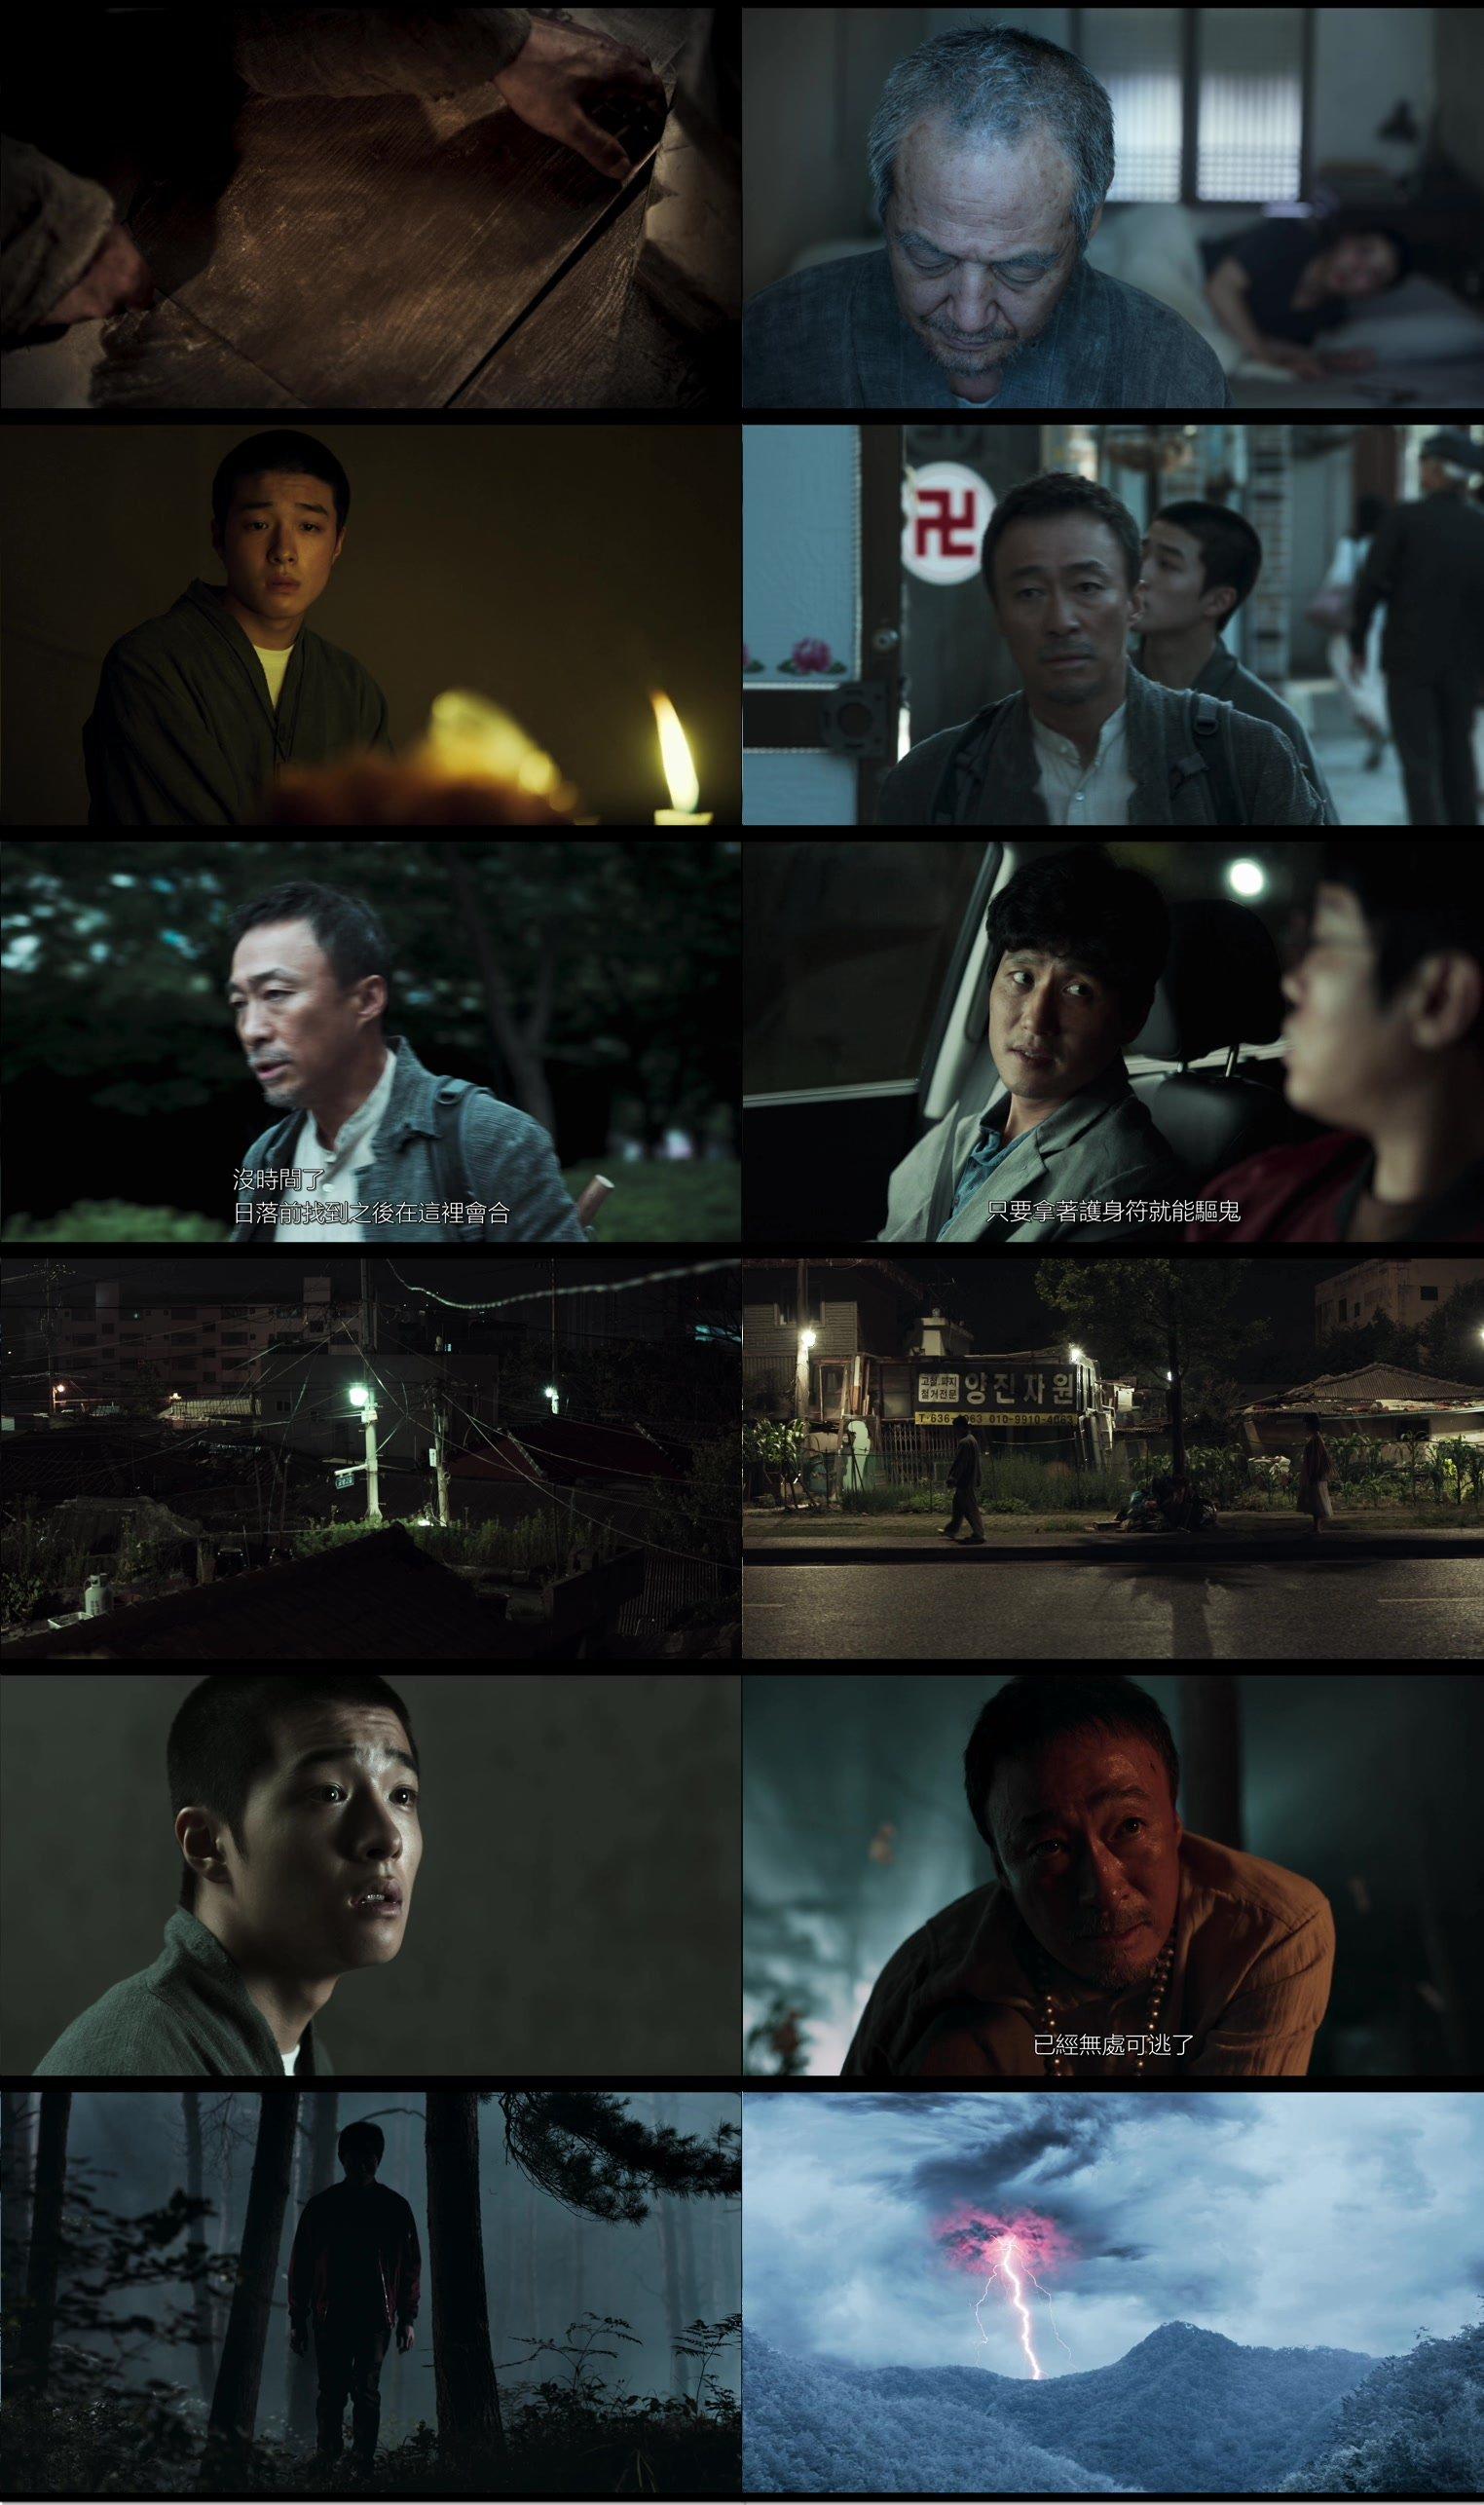 [x2]恐懼街|第八天之夜.2021.WEB-DL.720p|1080p[繁簡英]